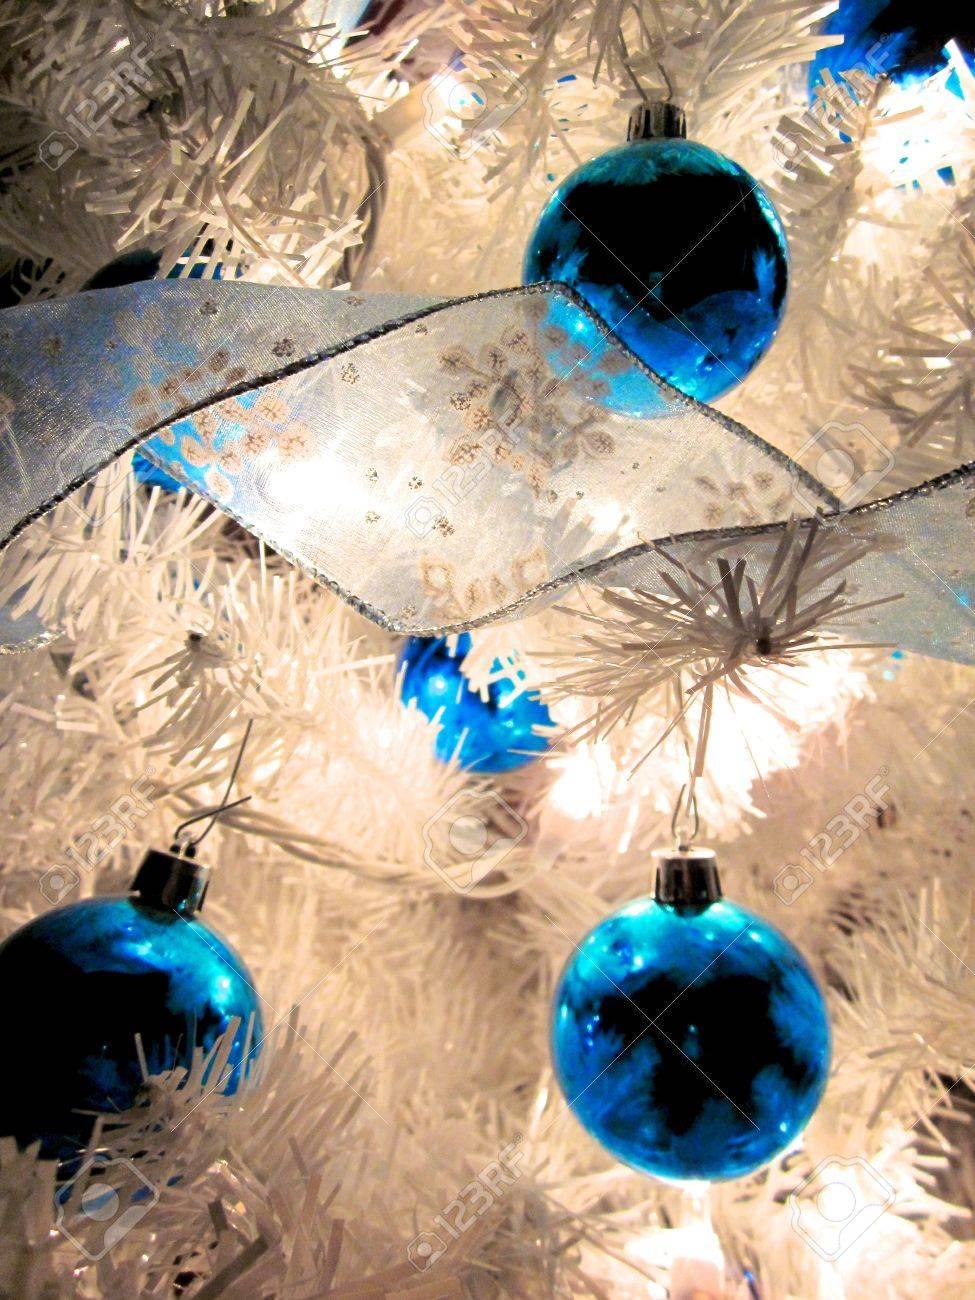 White christmas tree decorations blue - Blue Christmas Ornaments Hanging On A Lit White Christmas Tree Stock Photo 8592037